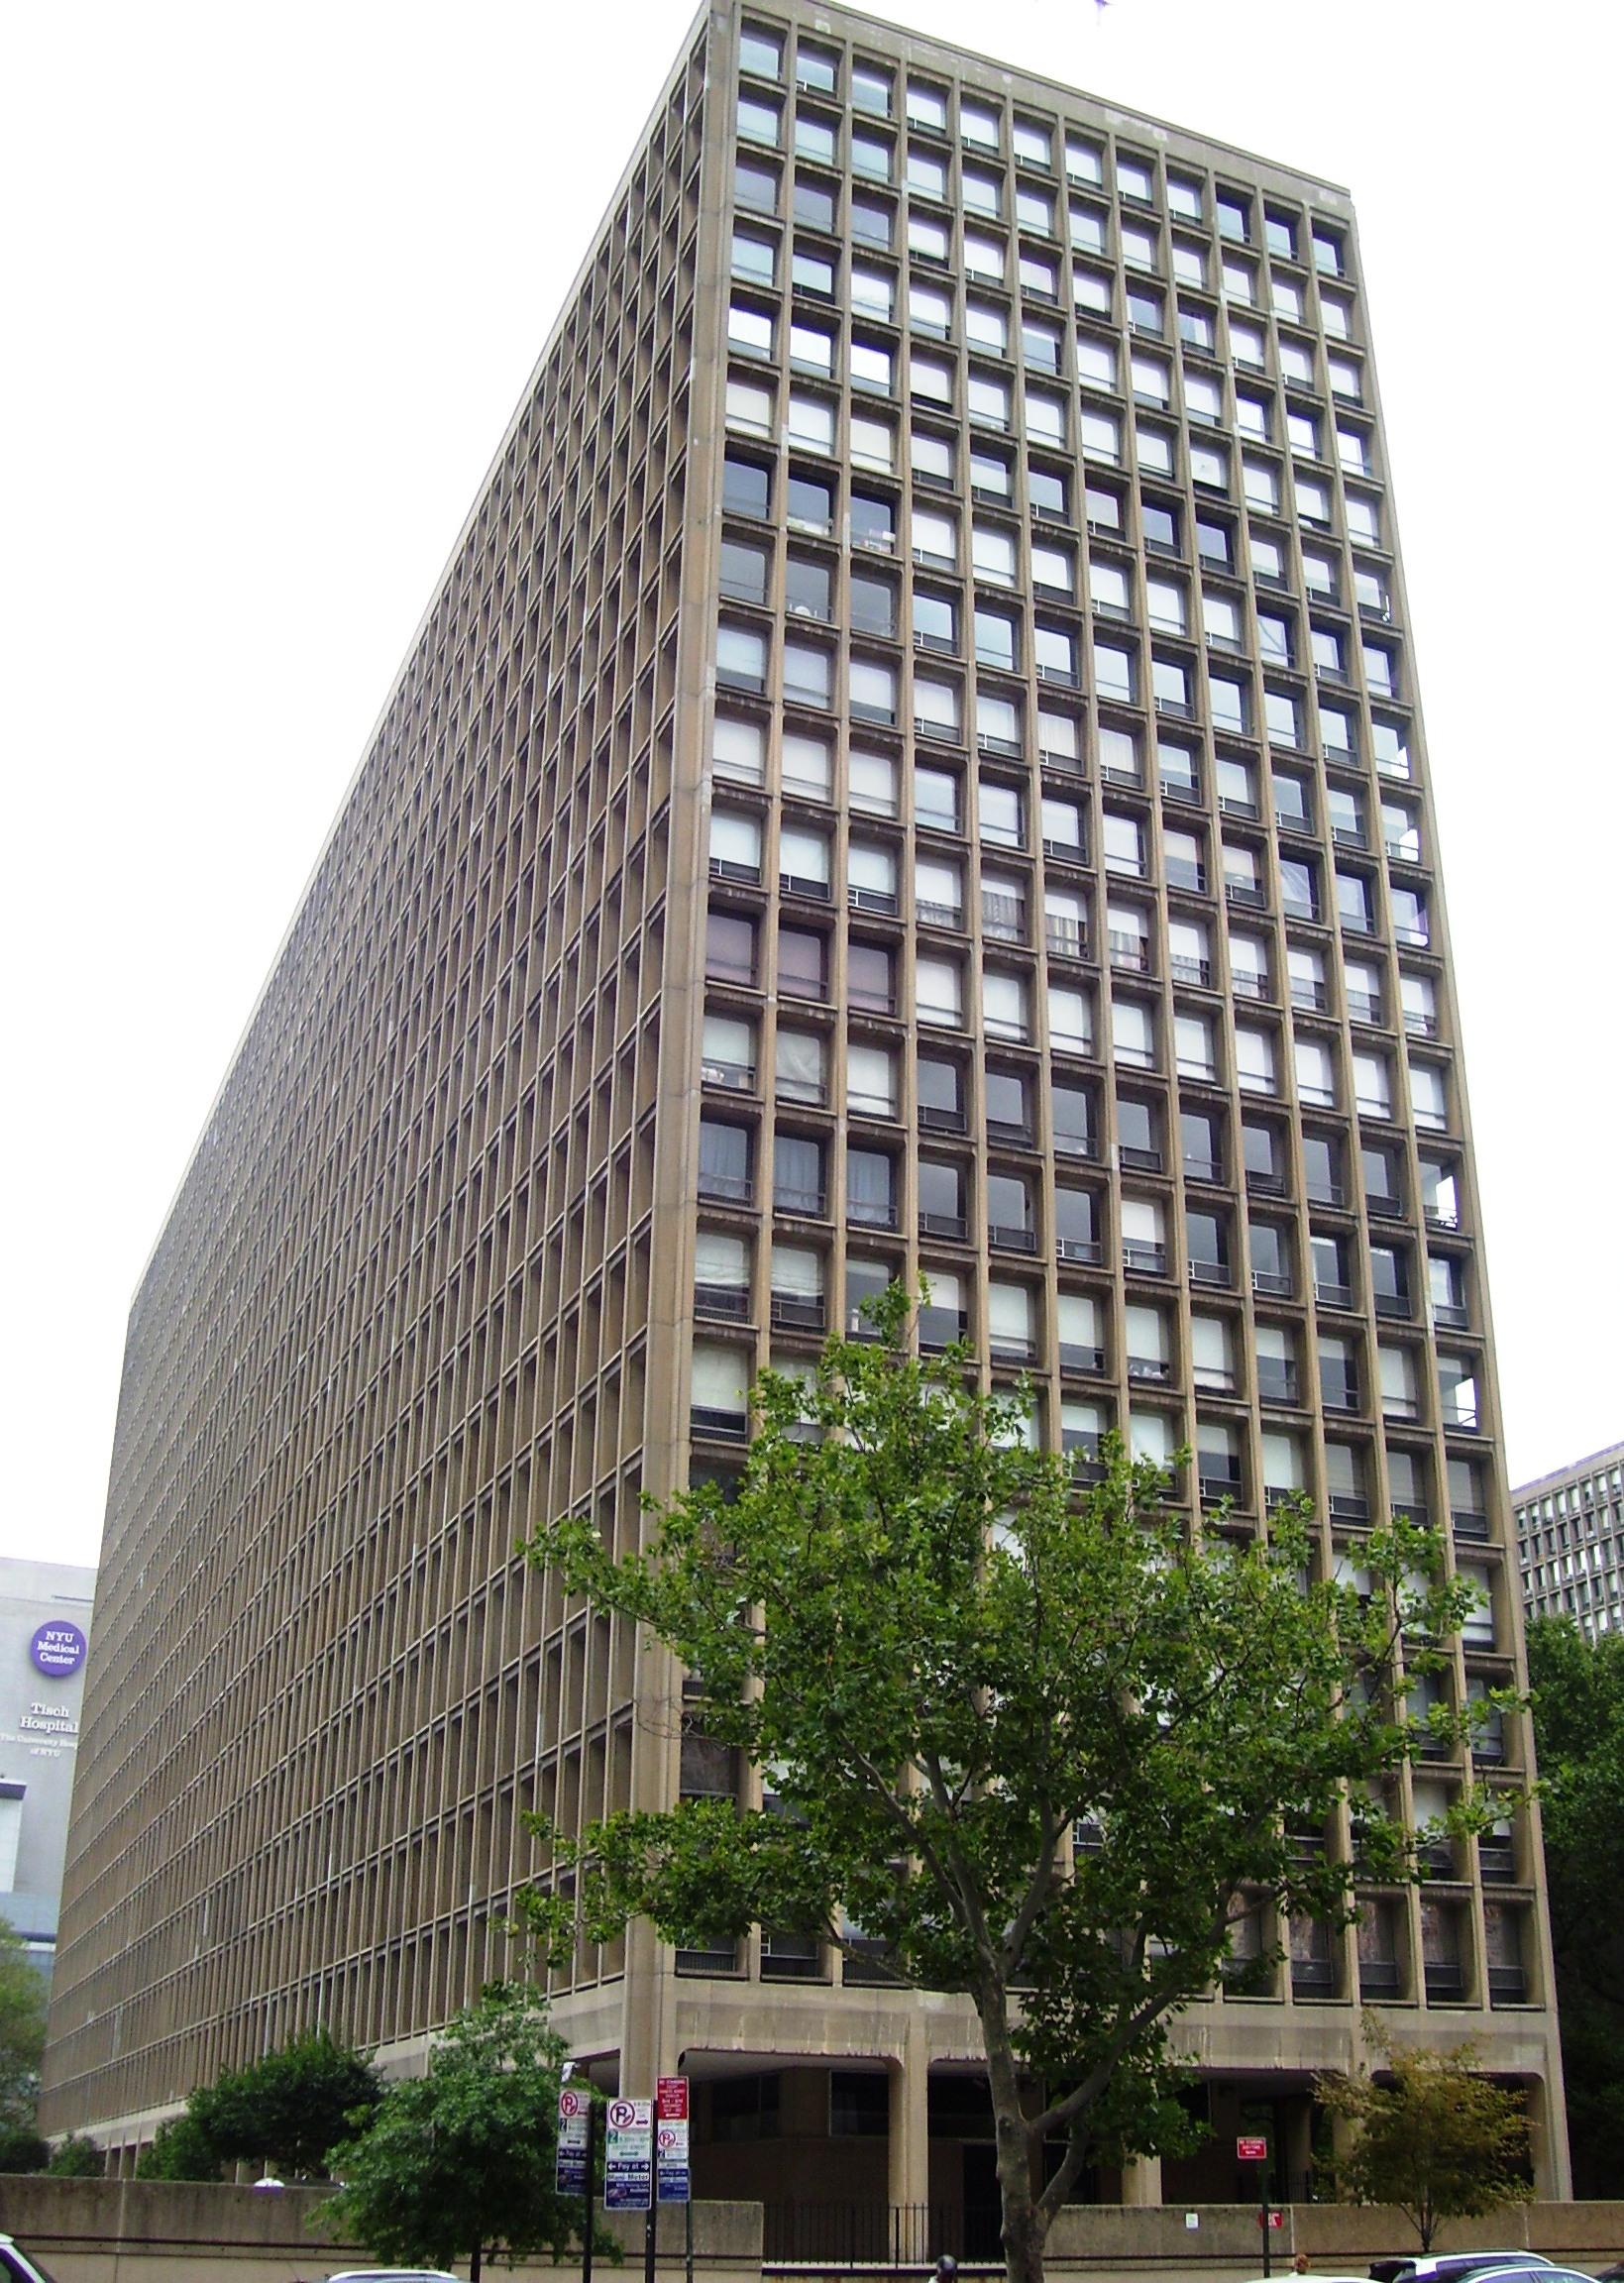 Kips Bay Towers - Wikipedia